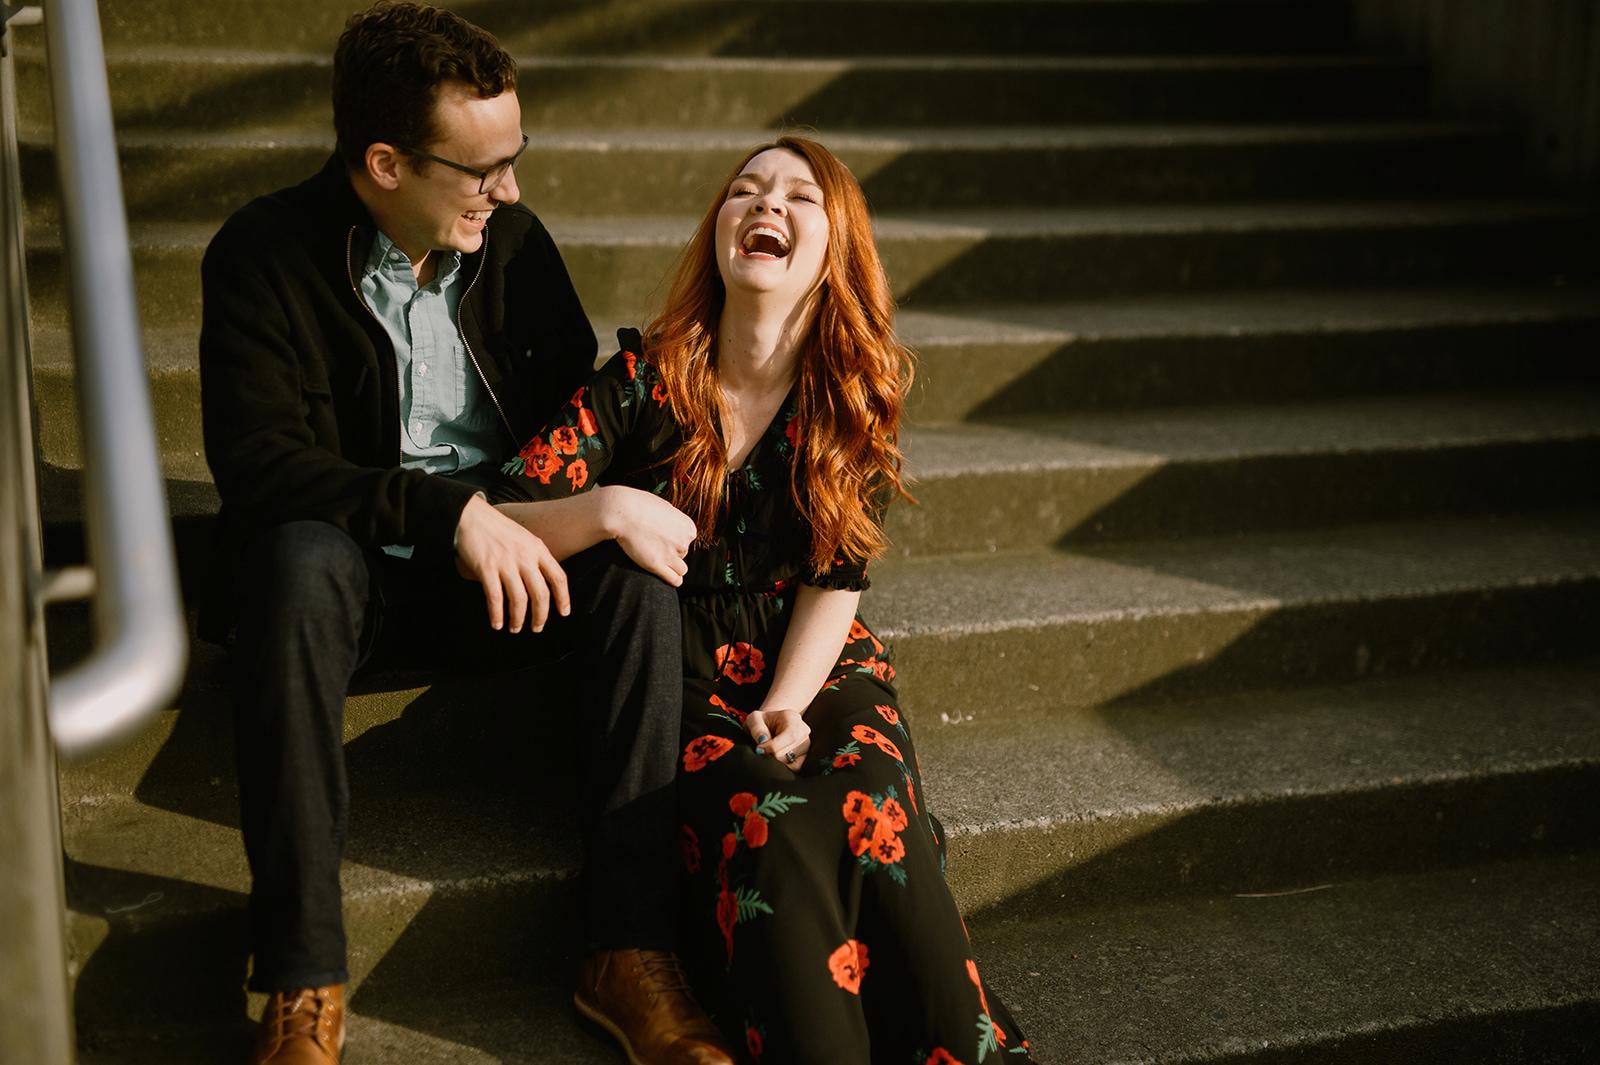 Rebecca-Christian-Engagement-Carly-Bish-Photography-69.jpg